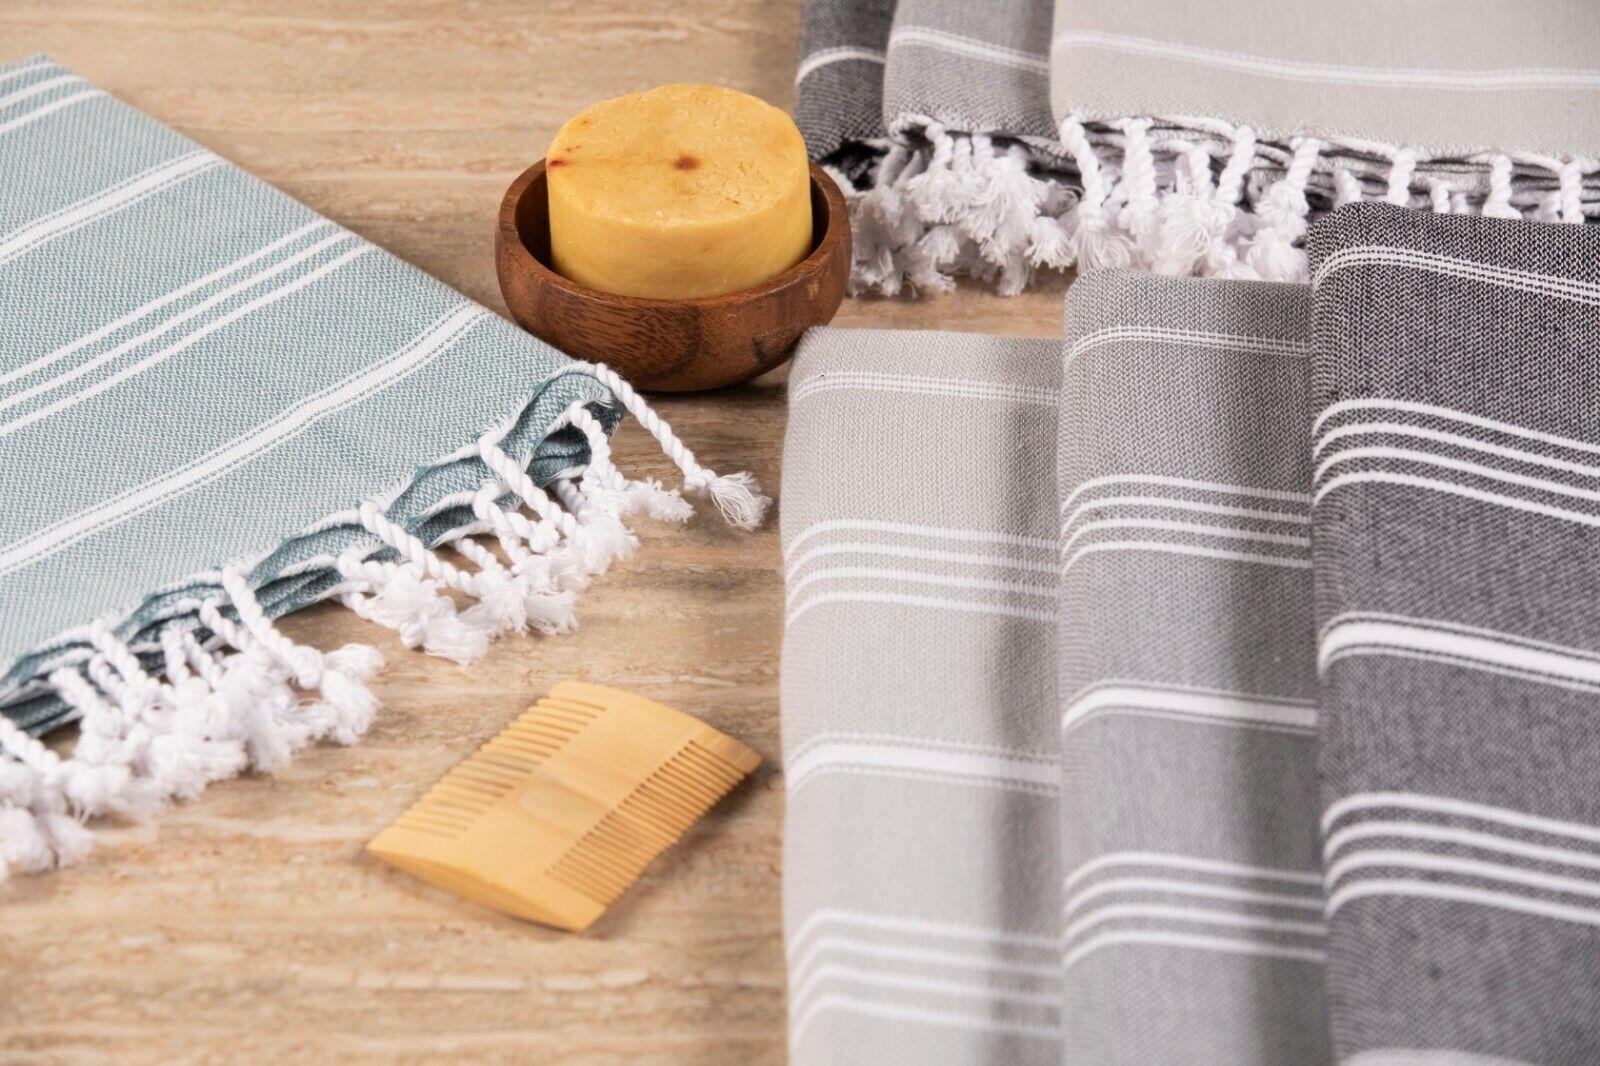 100% COTTON TURKISH BEACH TOWEL 39x69 BLANKET SARONG THROW